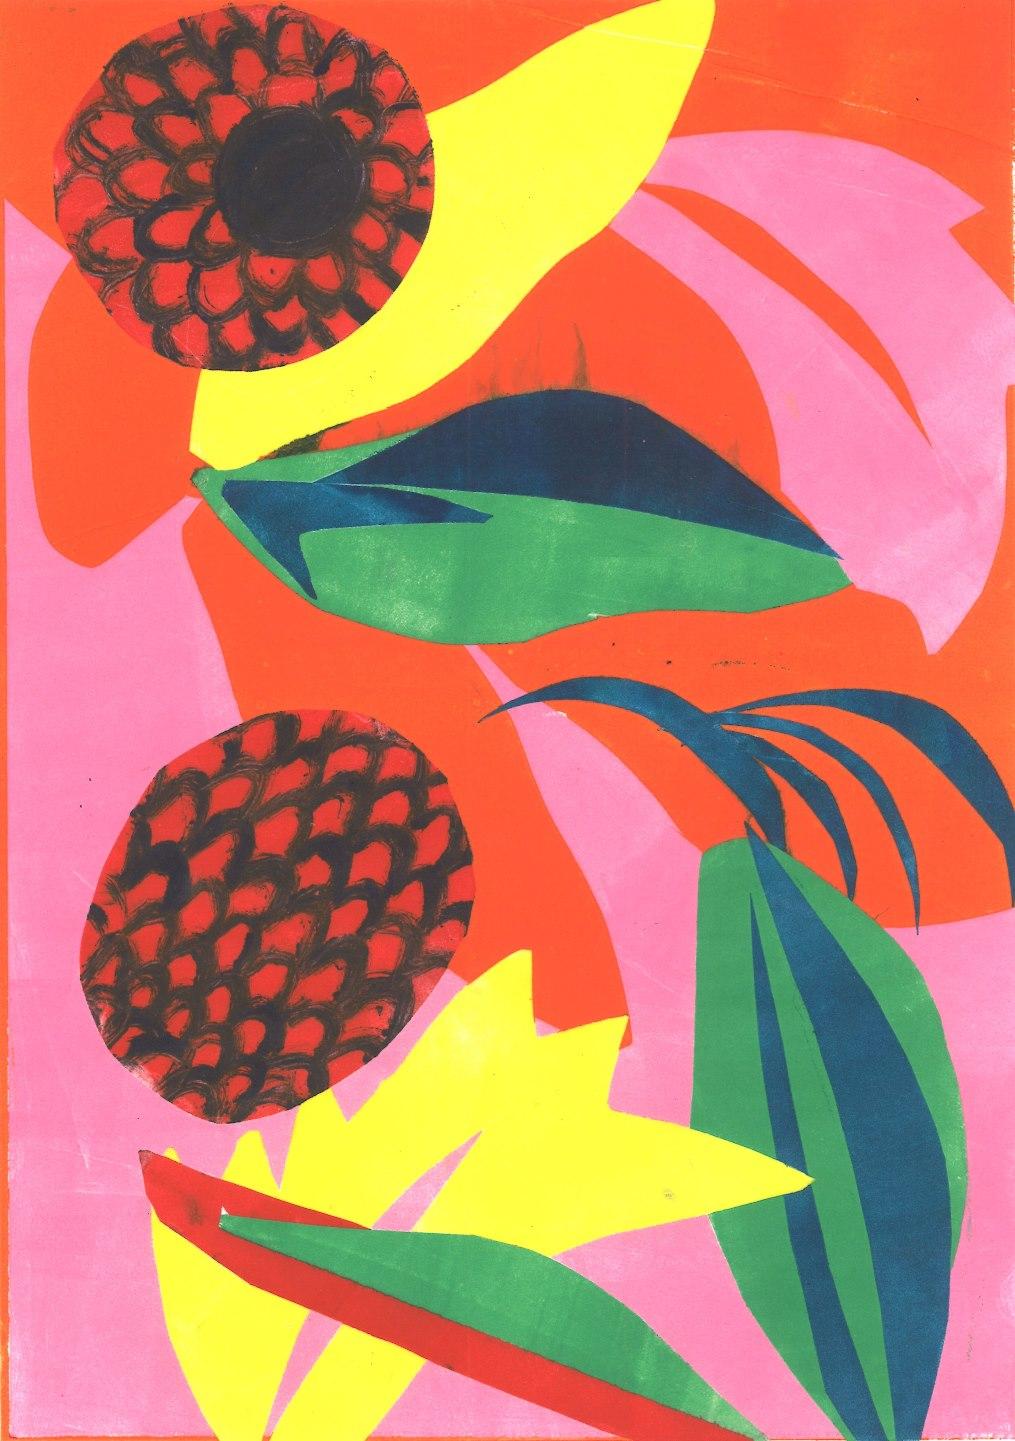 Atomic Fruit Rebecca Roscorla Monotype, 29.5 x 21 cms, 2017